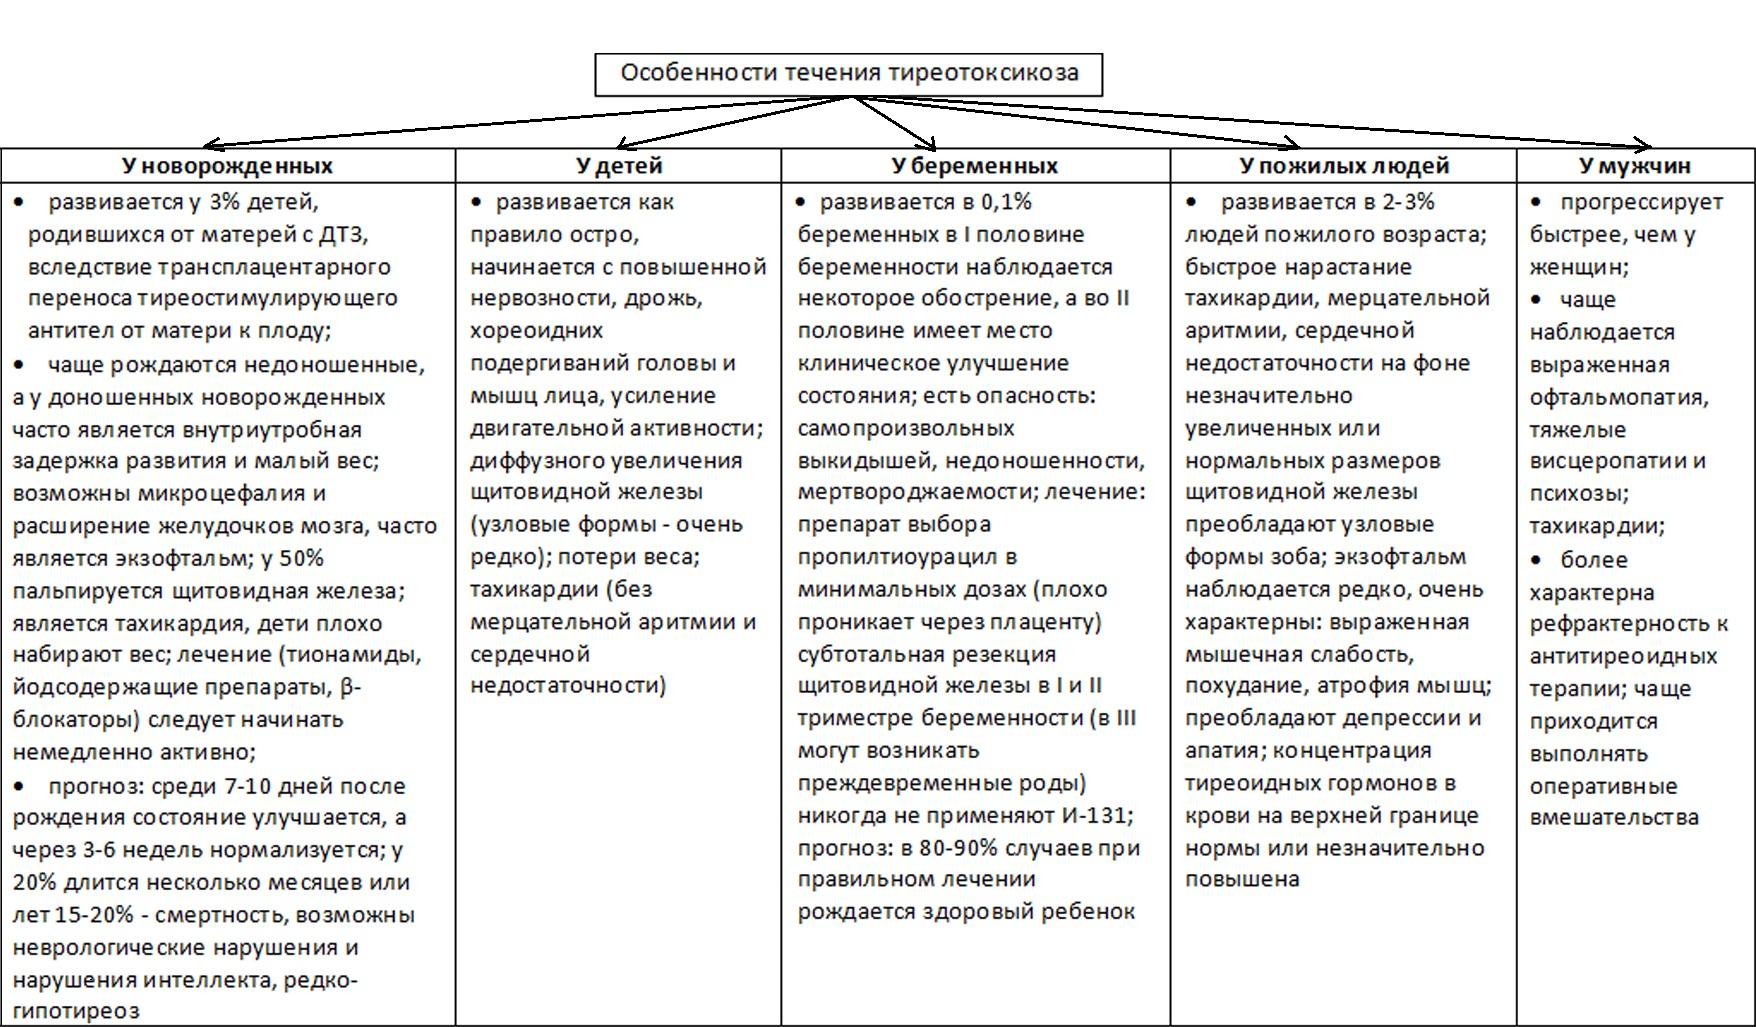 Гипертиреоз патогенез схема